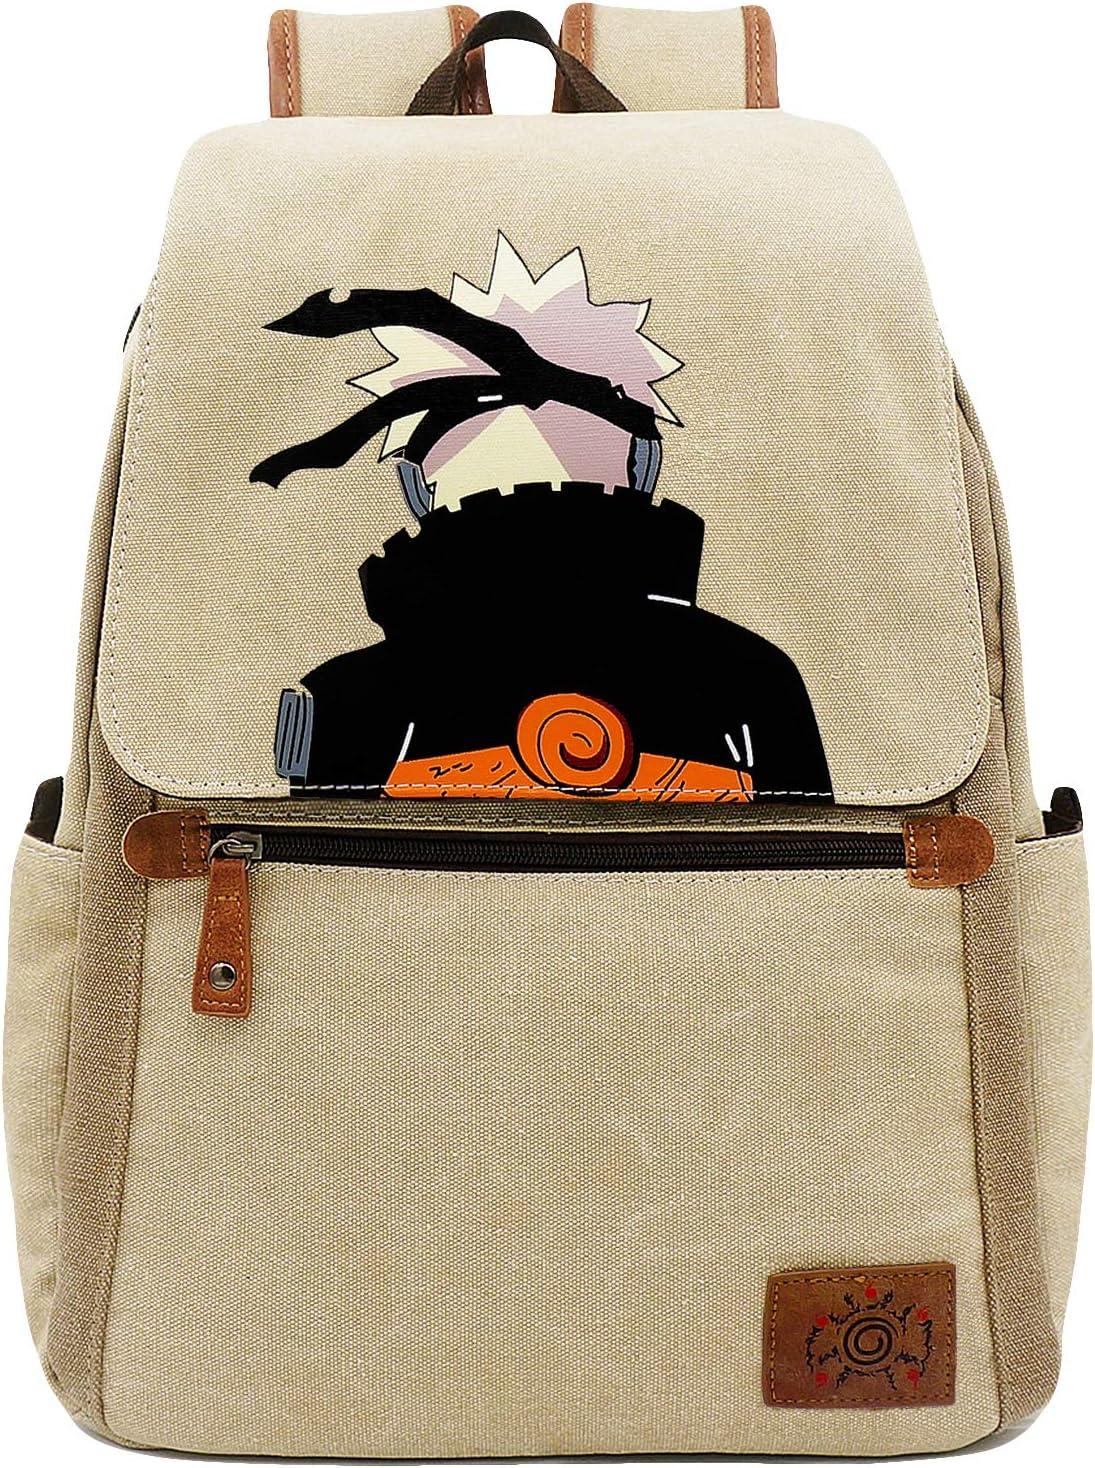 Roffatide Anime Naruto Backpack Cartoon Book Bag Casual Canvas Bag Laptop Back Pack